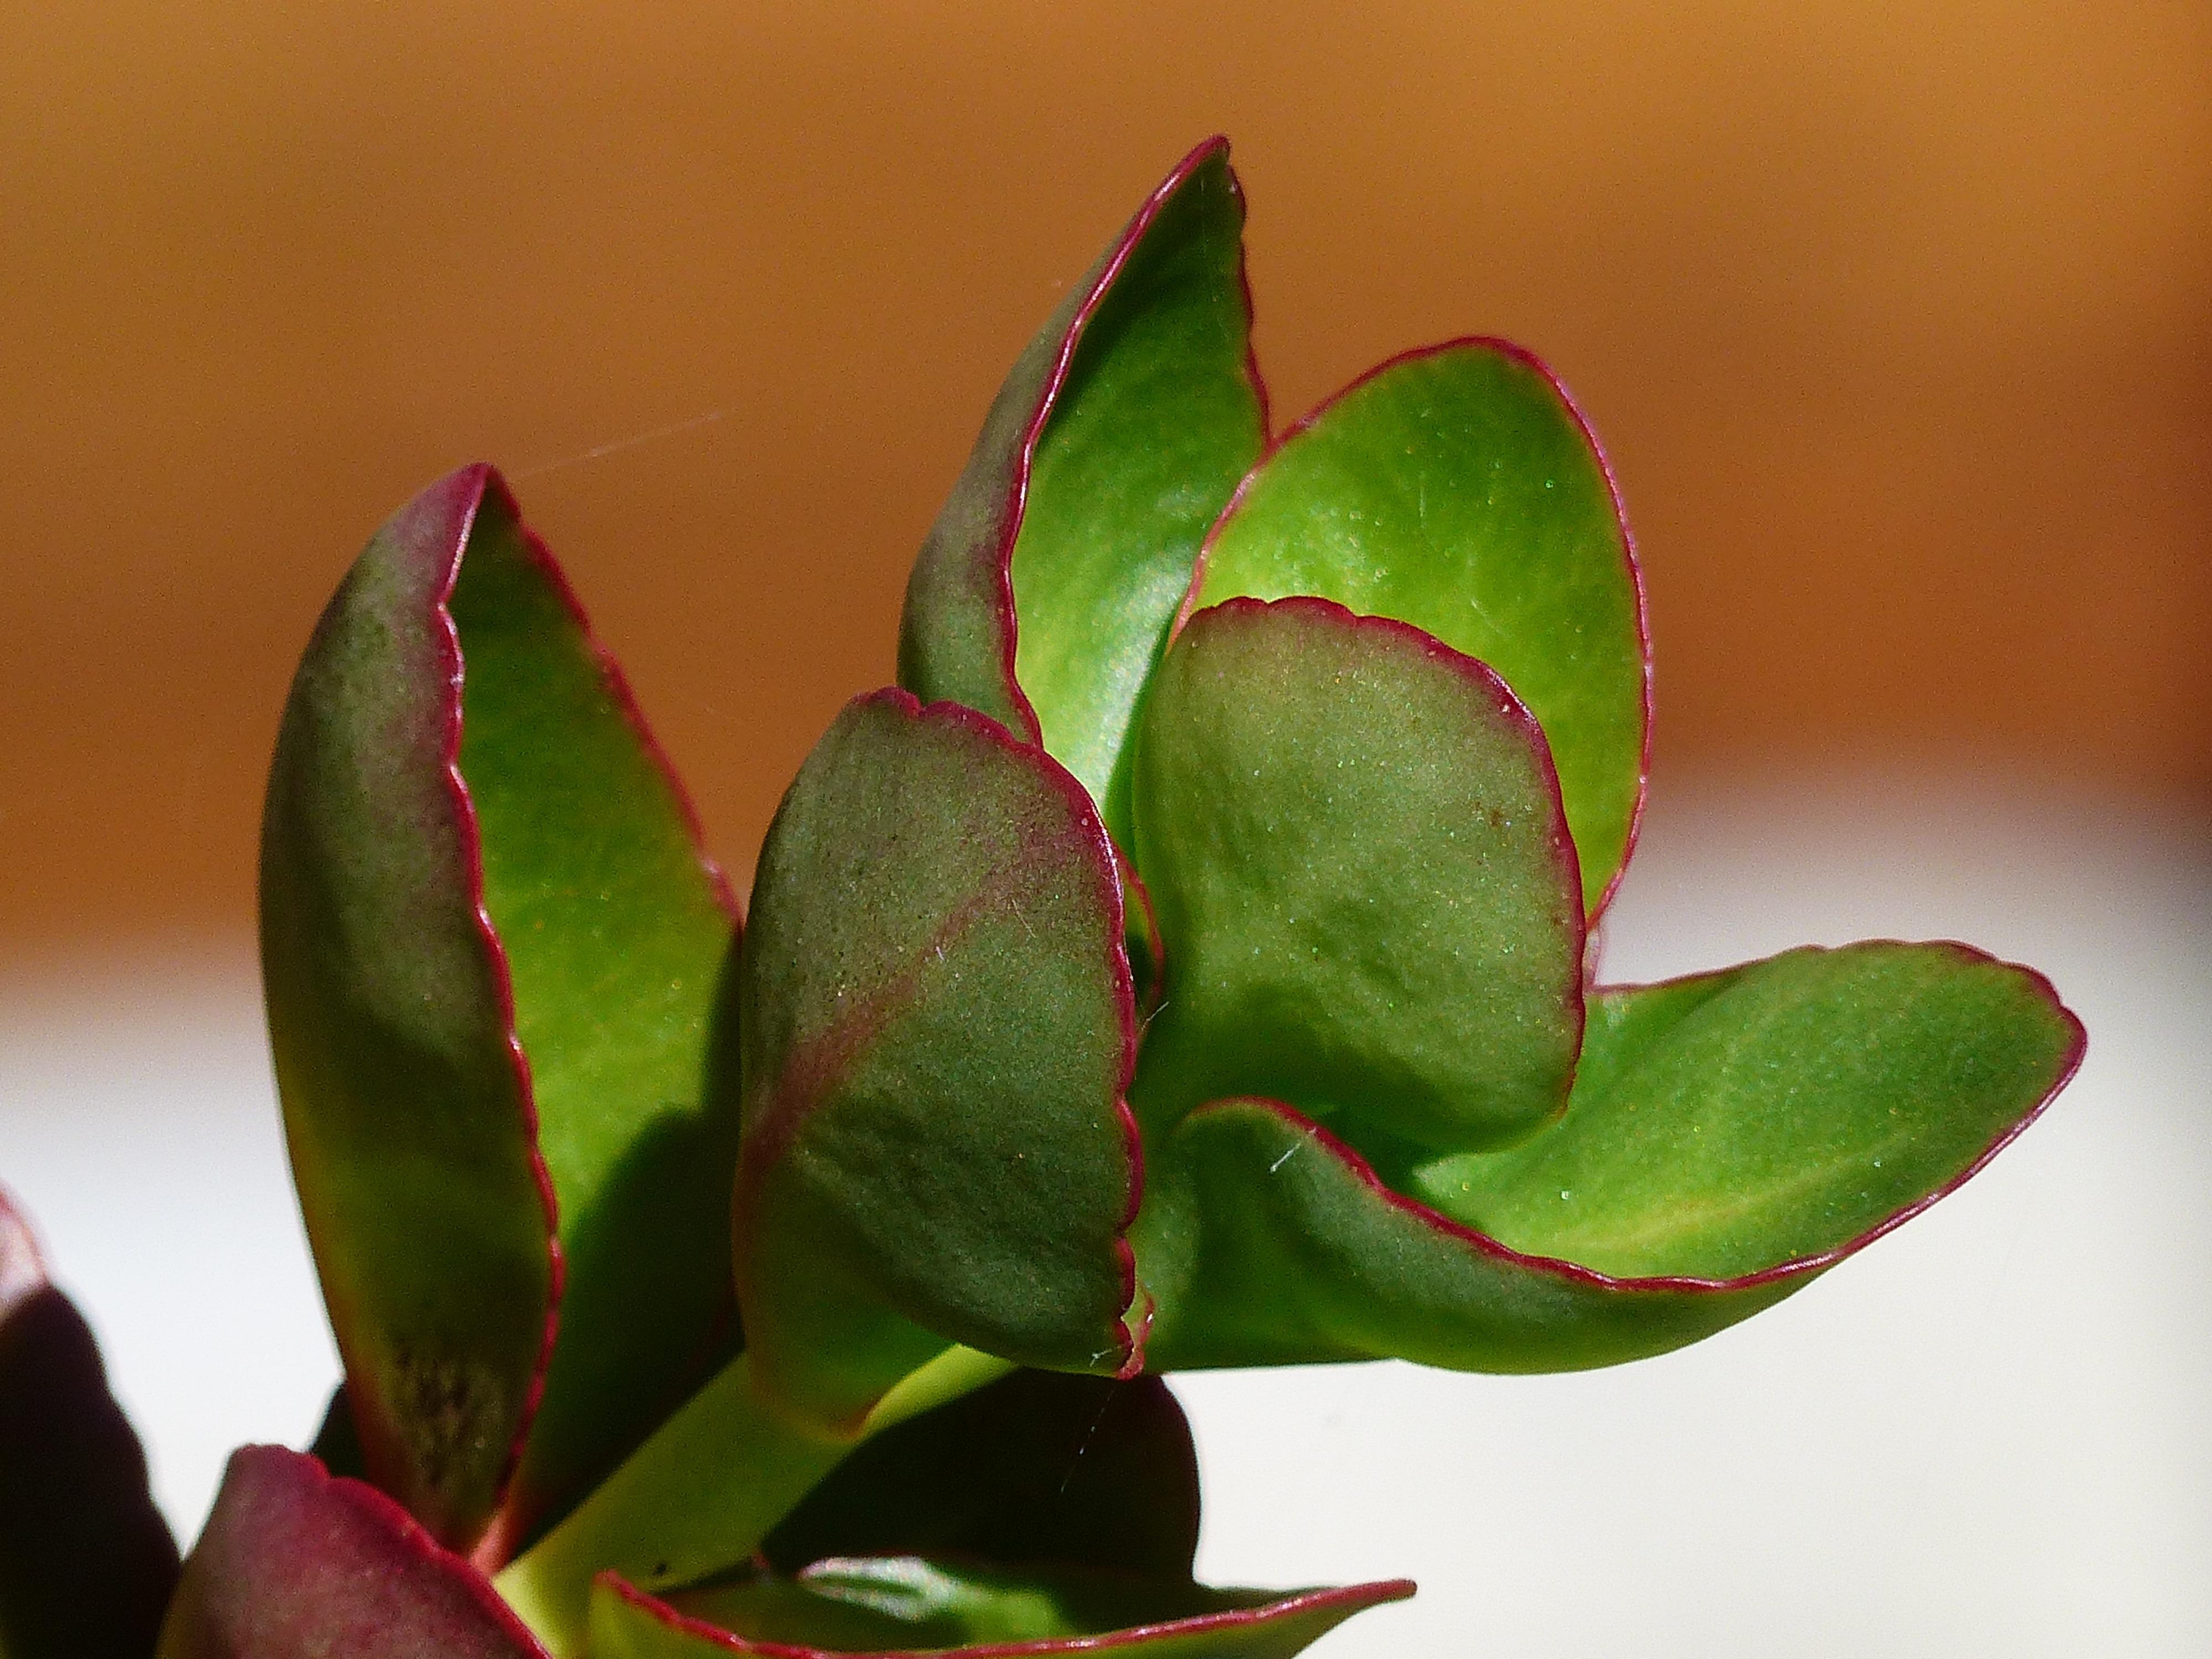 free images branch blossom leaf flower petal green red